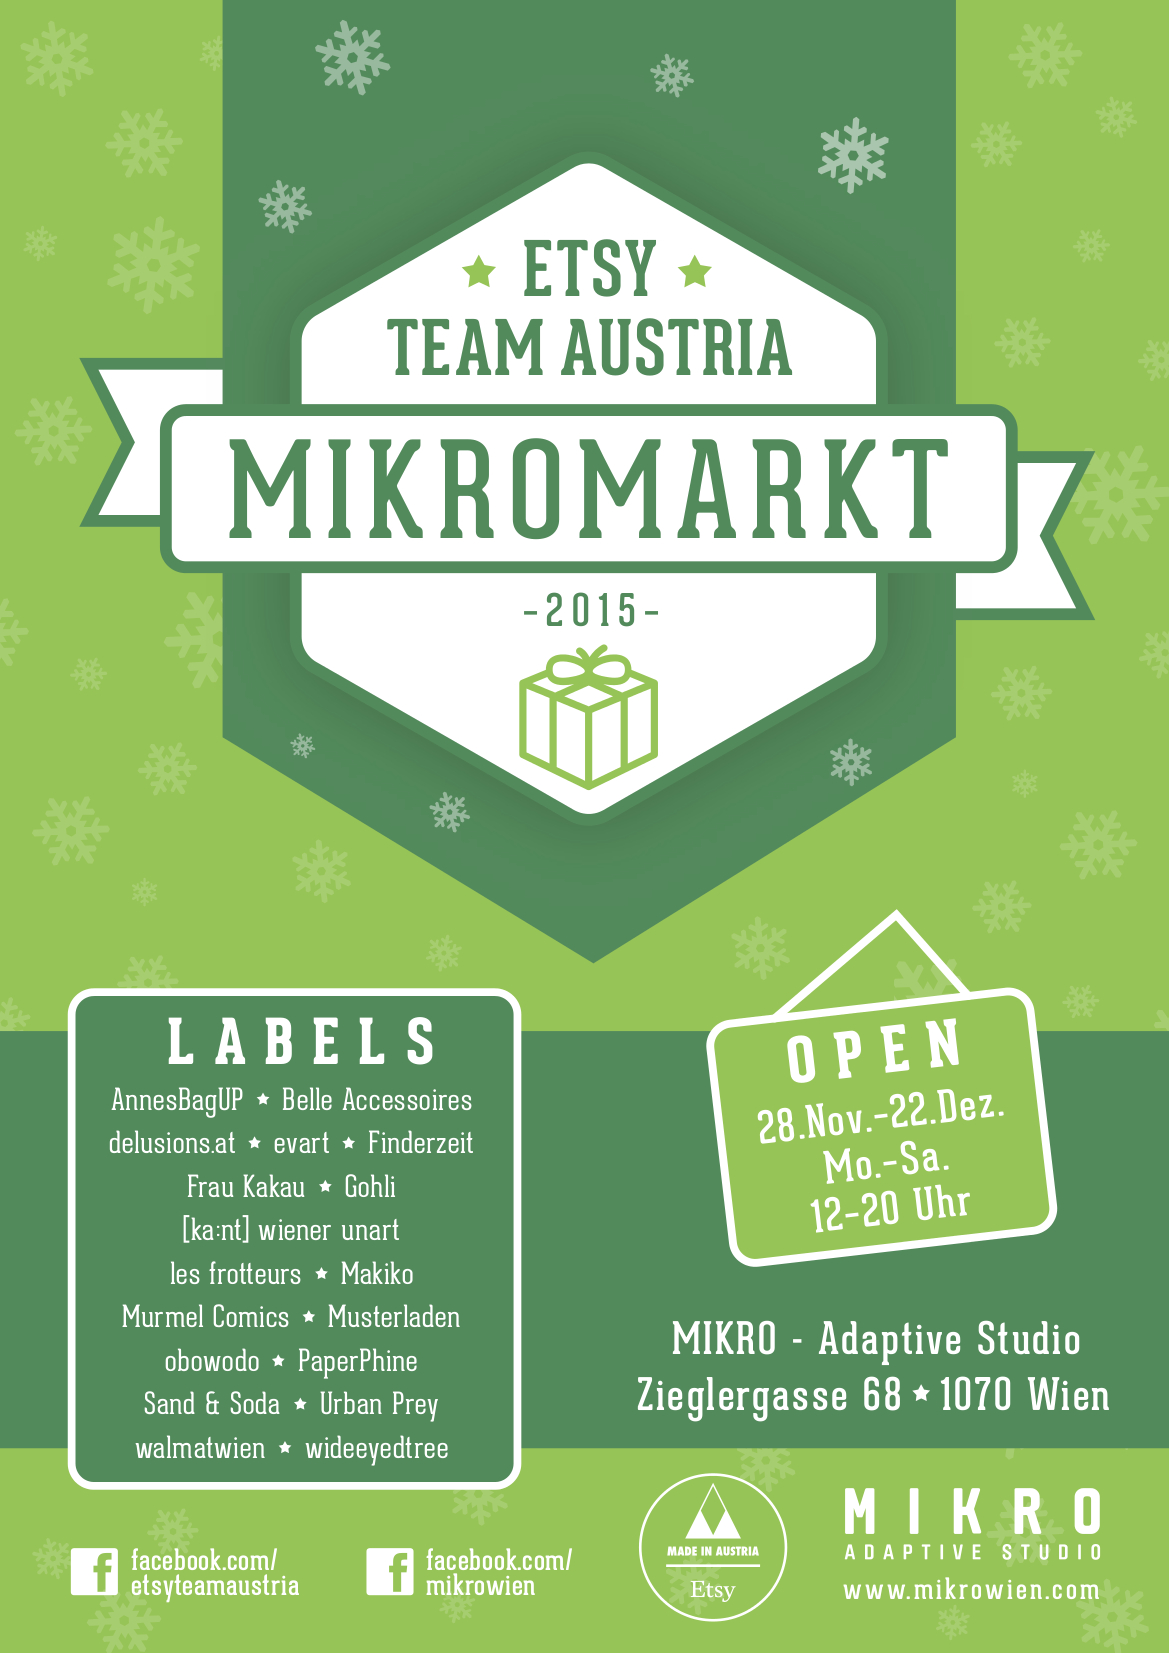 eta_mikromarkt_poster